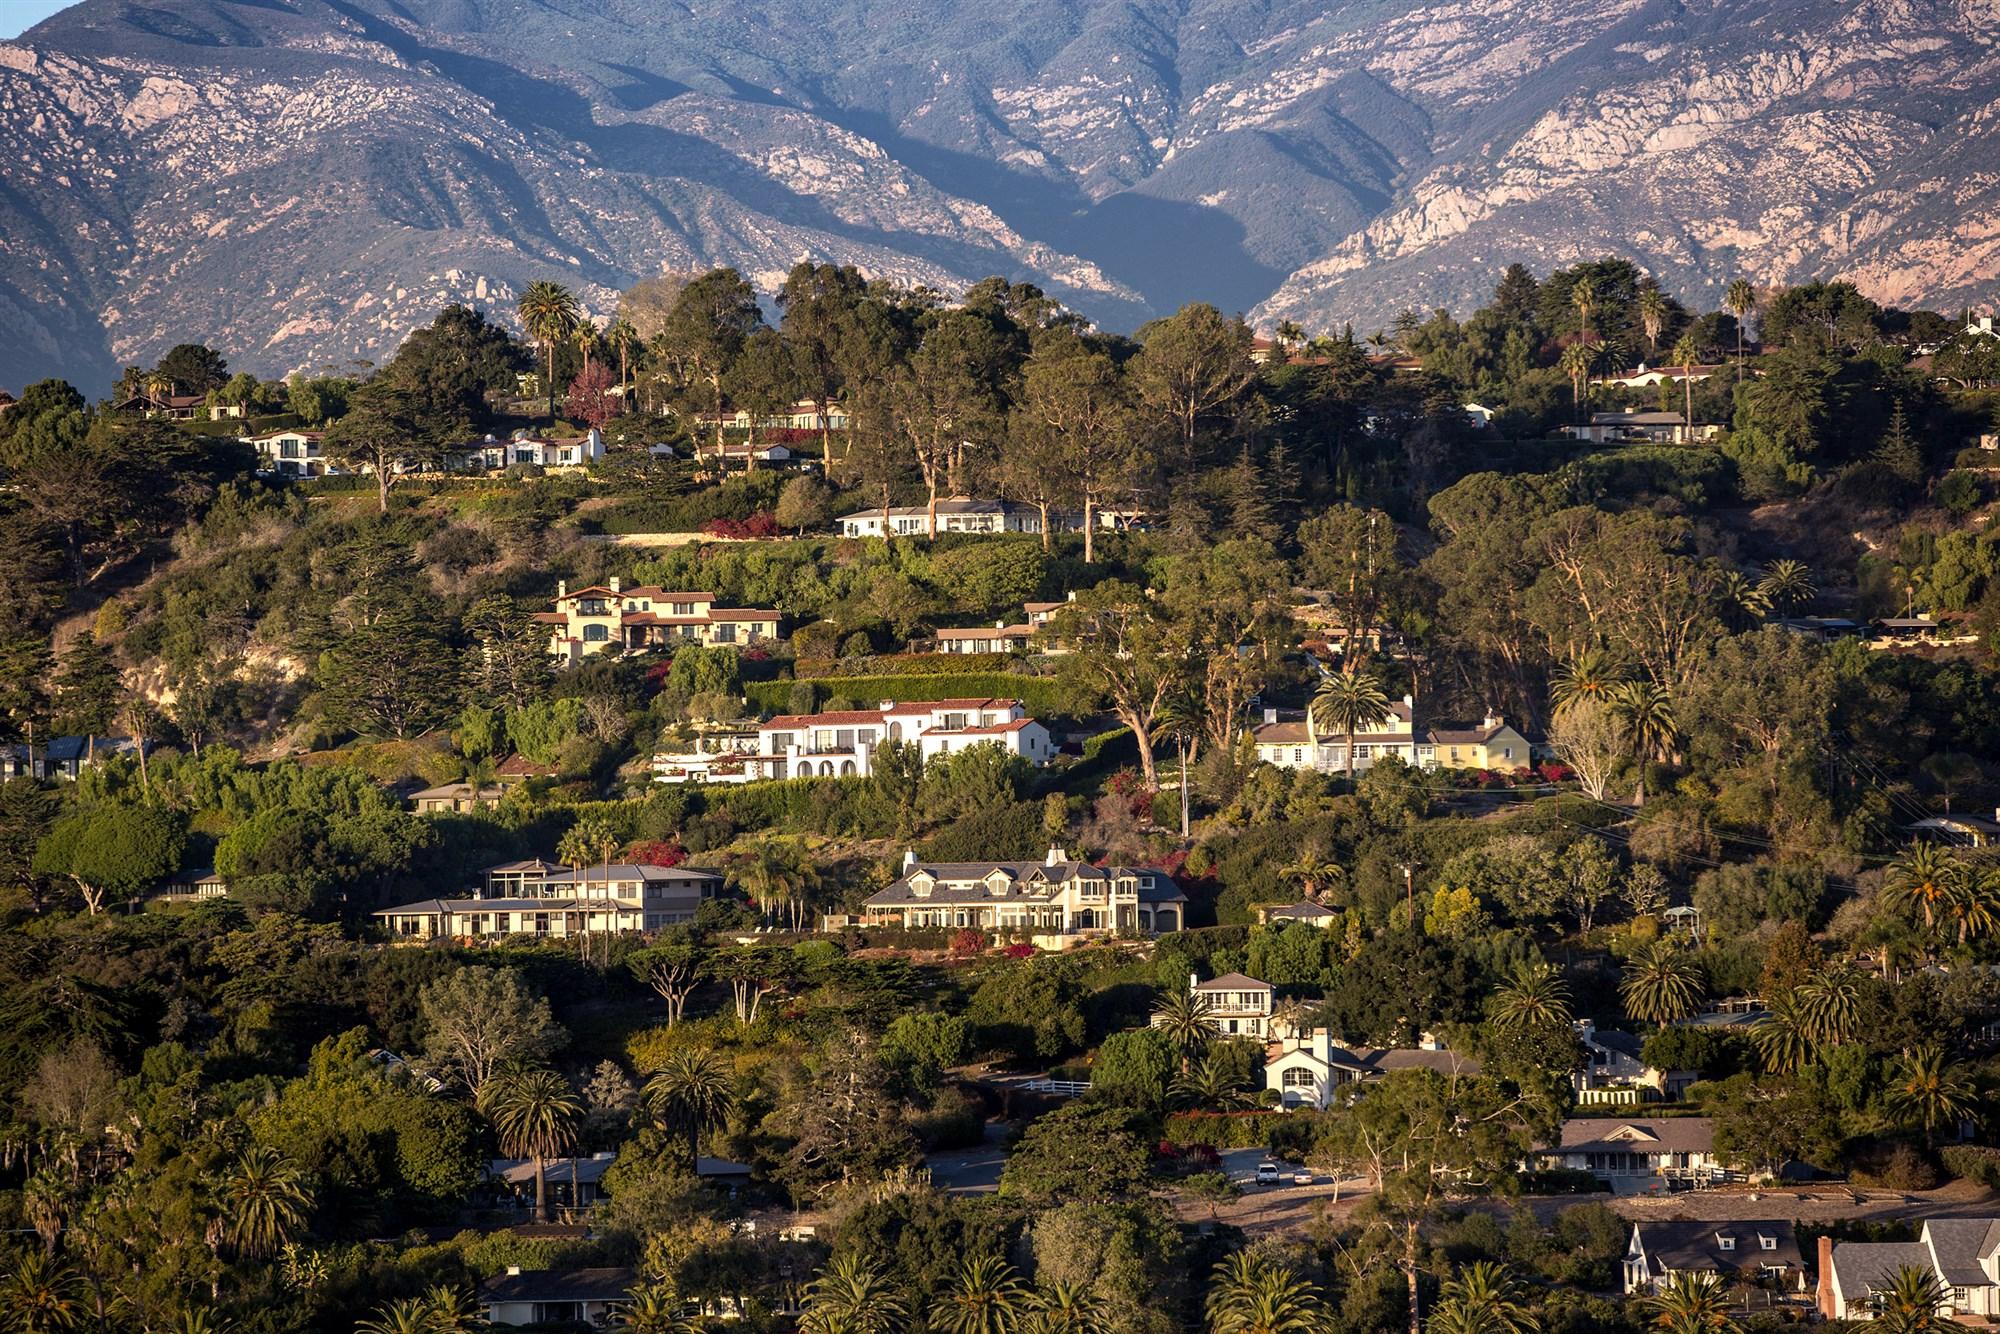 The exclusive Hope Ranch area on Dec. 4, 2017, over Santa Barbara, California.